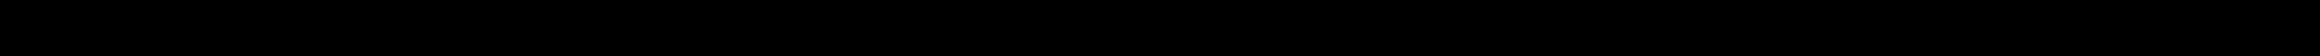 RIDEX 1N4402H, 25184029, 96389188, 96818899, 1109 38 Filtr oleju